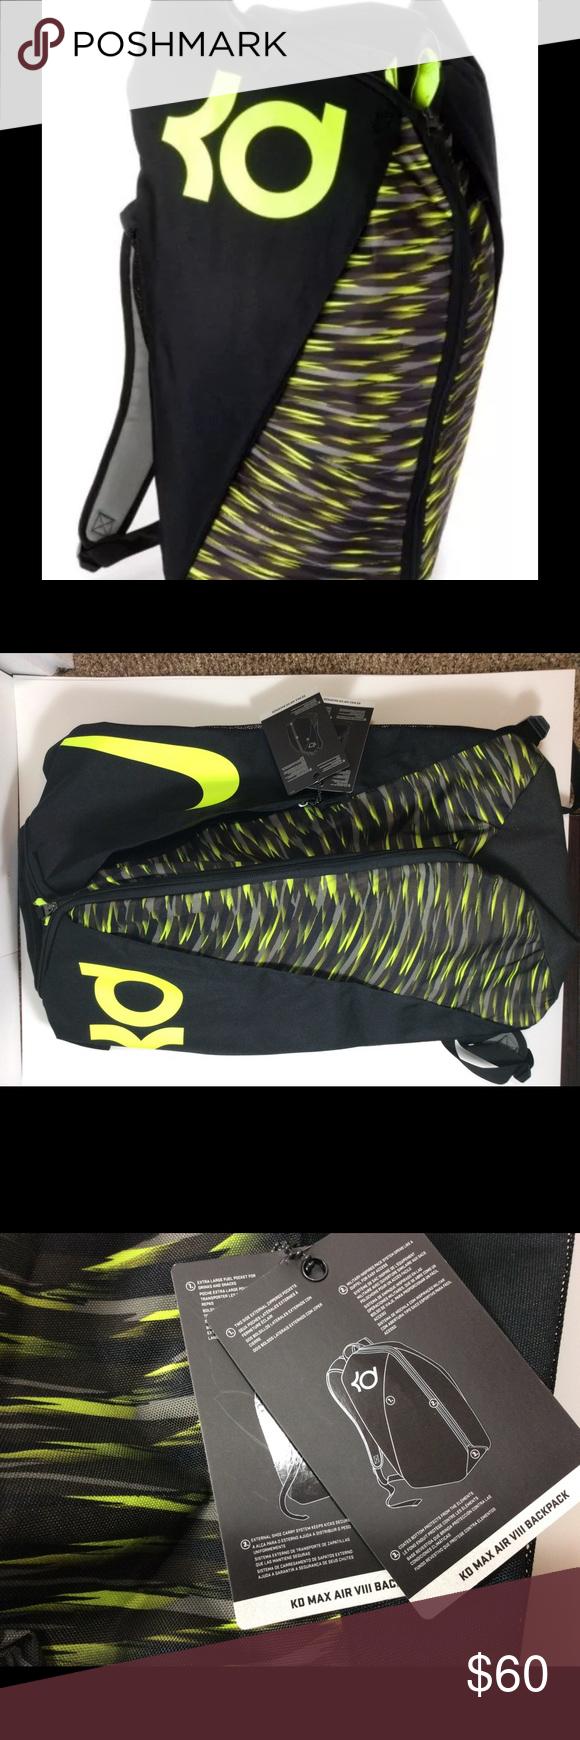 e0063c160171 🏀NEW Nike KD VIII Max Air Basketball Backpack🏀 NIKE KD VIII MAX AIR KEVIN